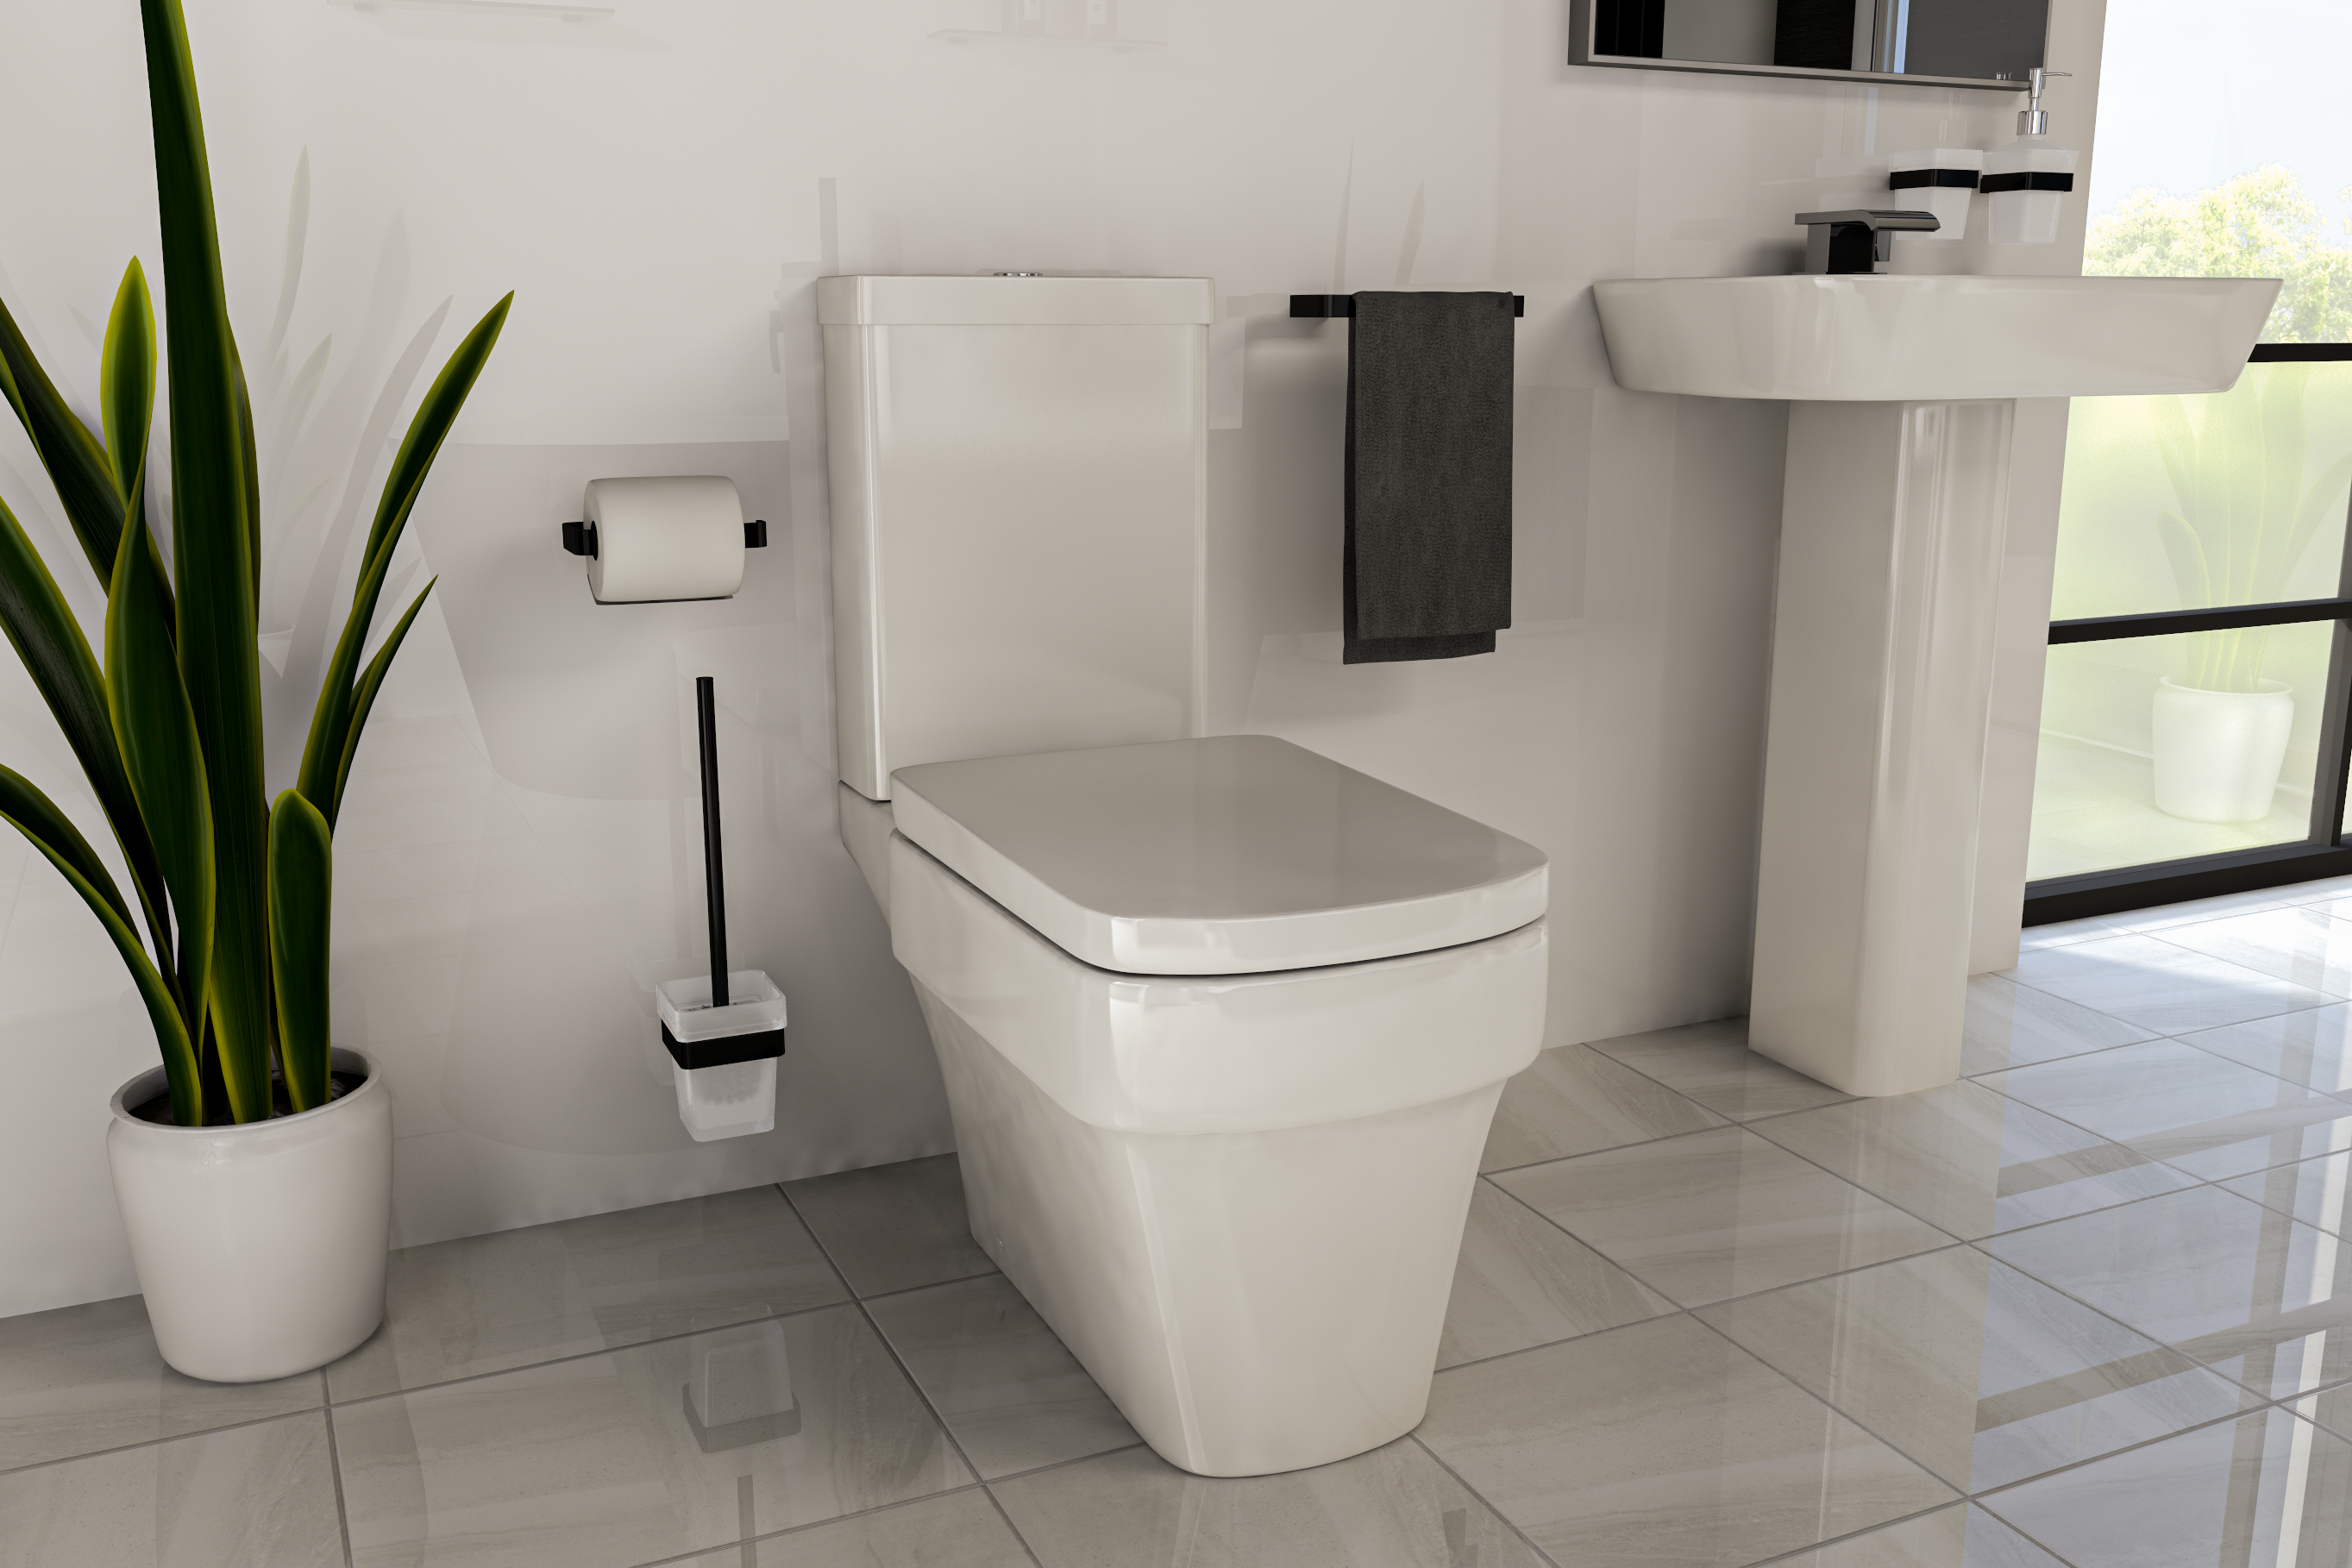 A Wall Mounted Toilet Brush Yes Please Wholesaledomesticbathrooms Toiletbrushideas Toiletbrush Blackbathro In 2020 Wall Mounted Toilet Black Walls Toilet Brush